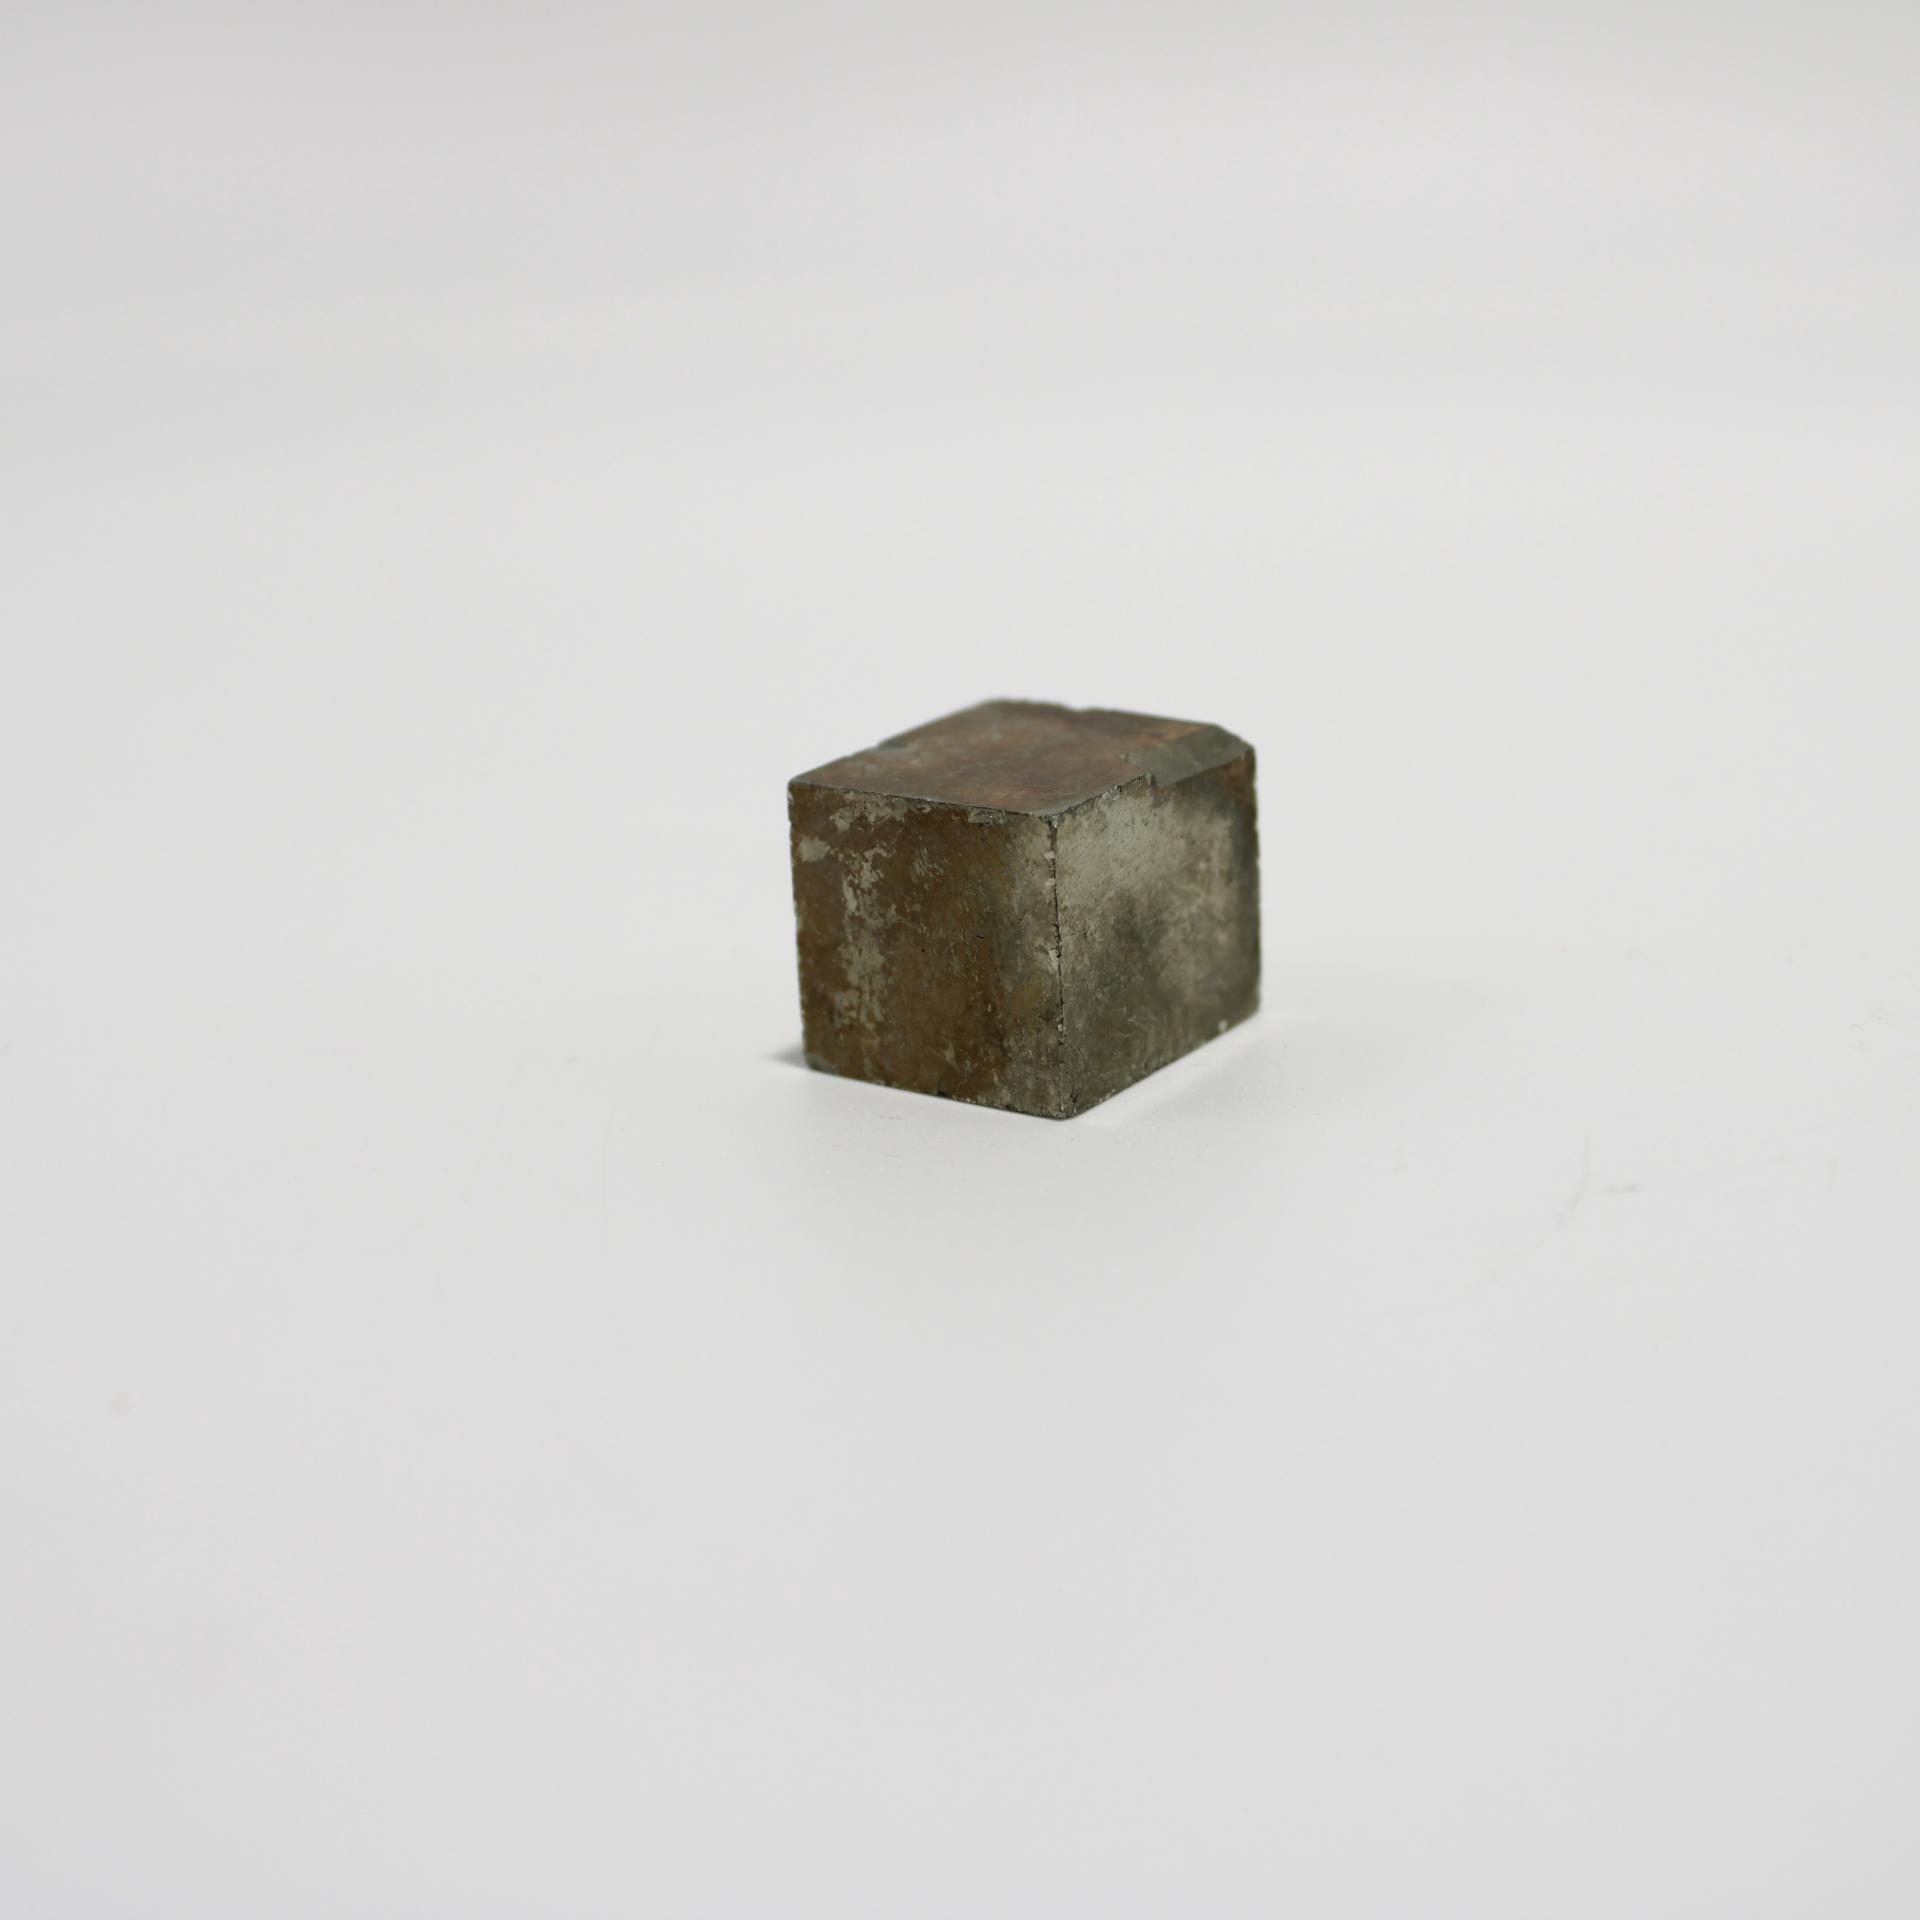 I79 pyritecube 2